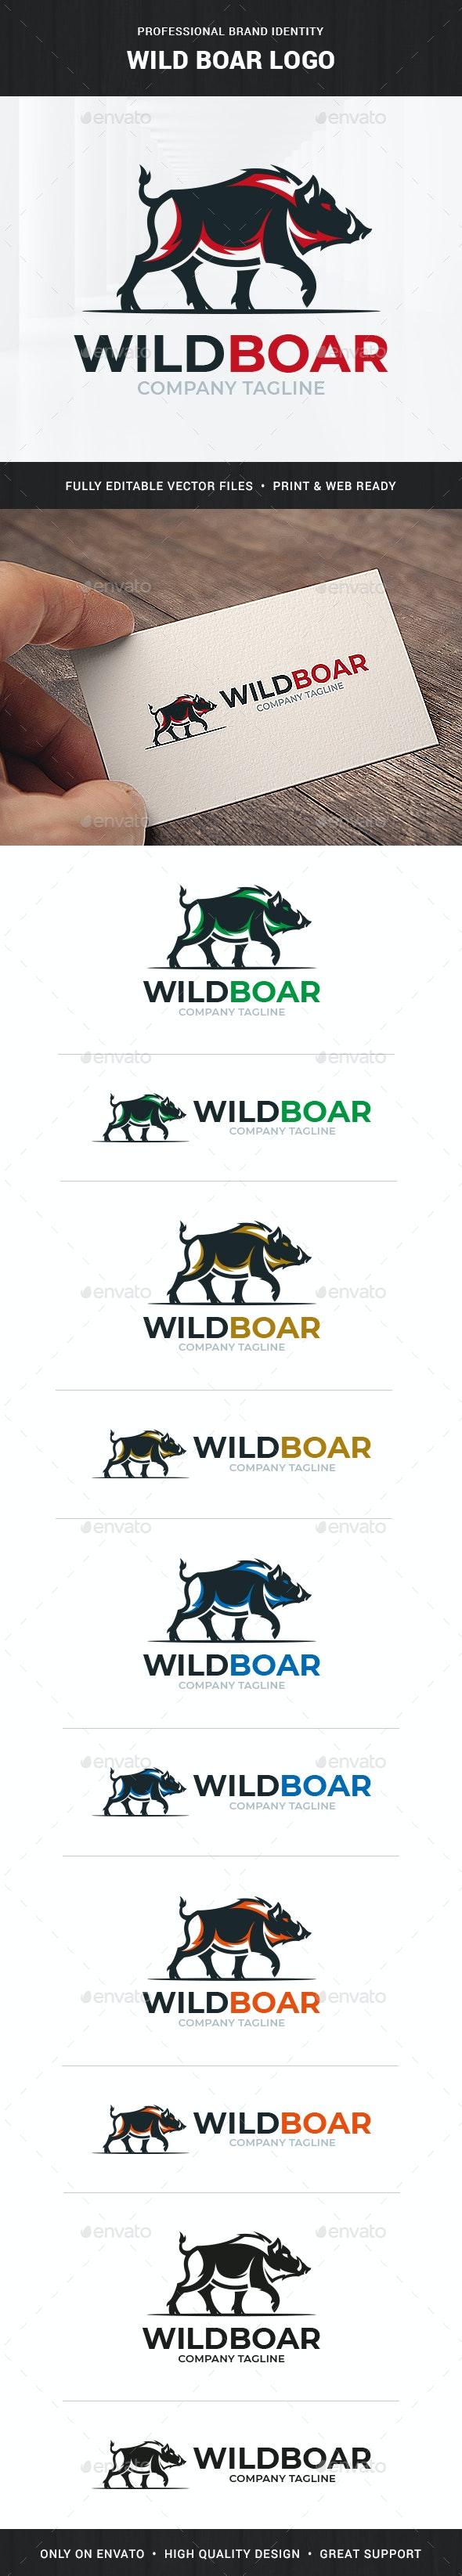 Wild Boar Logo Template - Animals Logo Templates